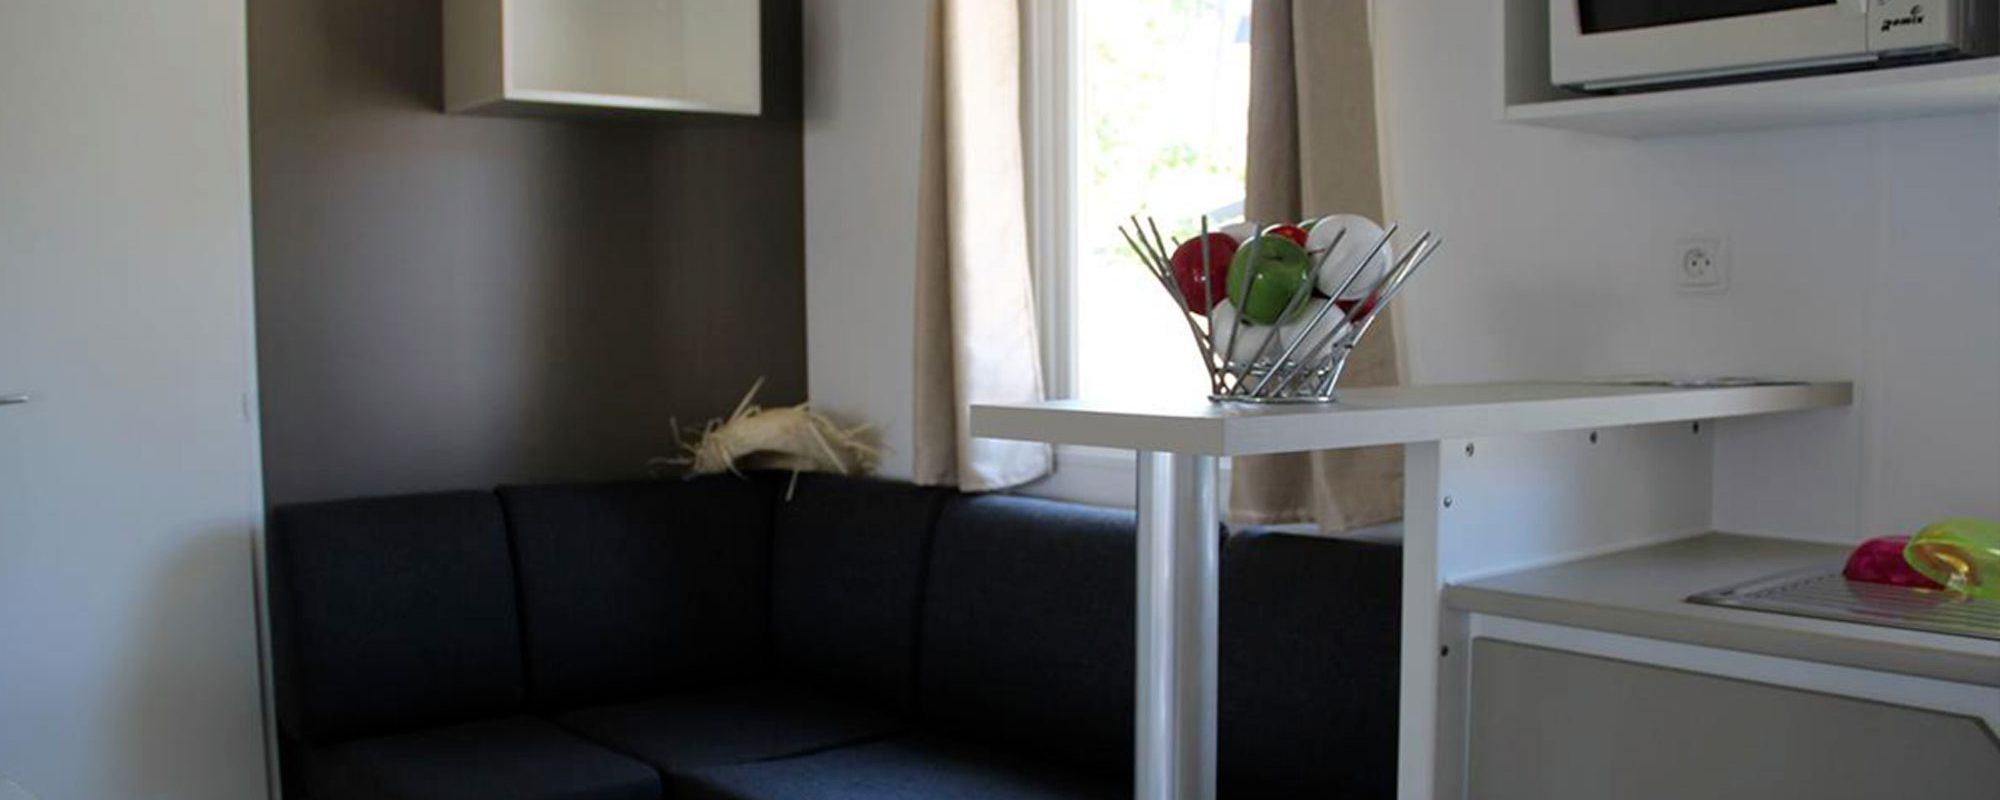 salon du mobilhome cordelia en vente camping à proximité de Guérande